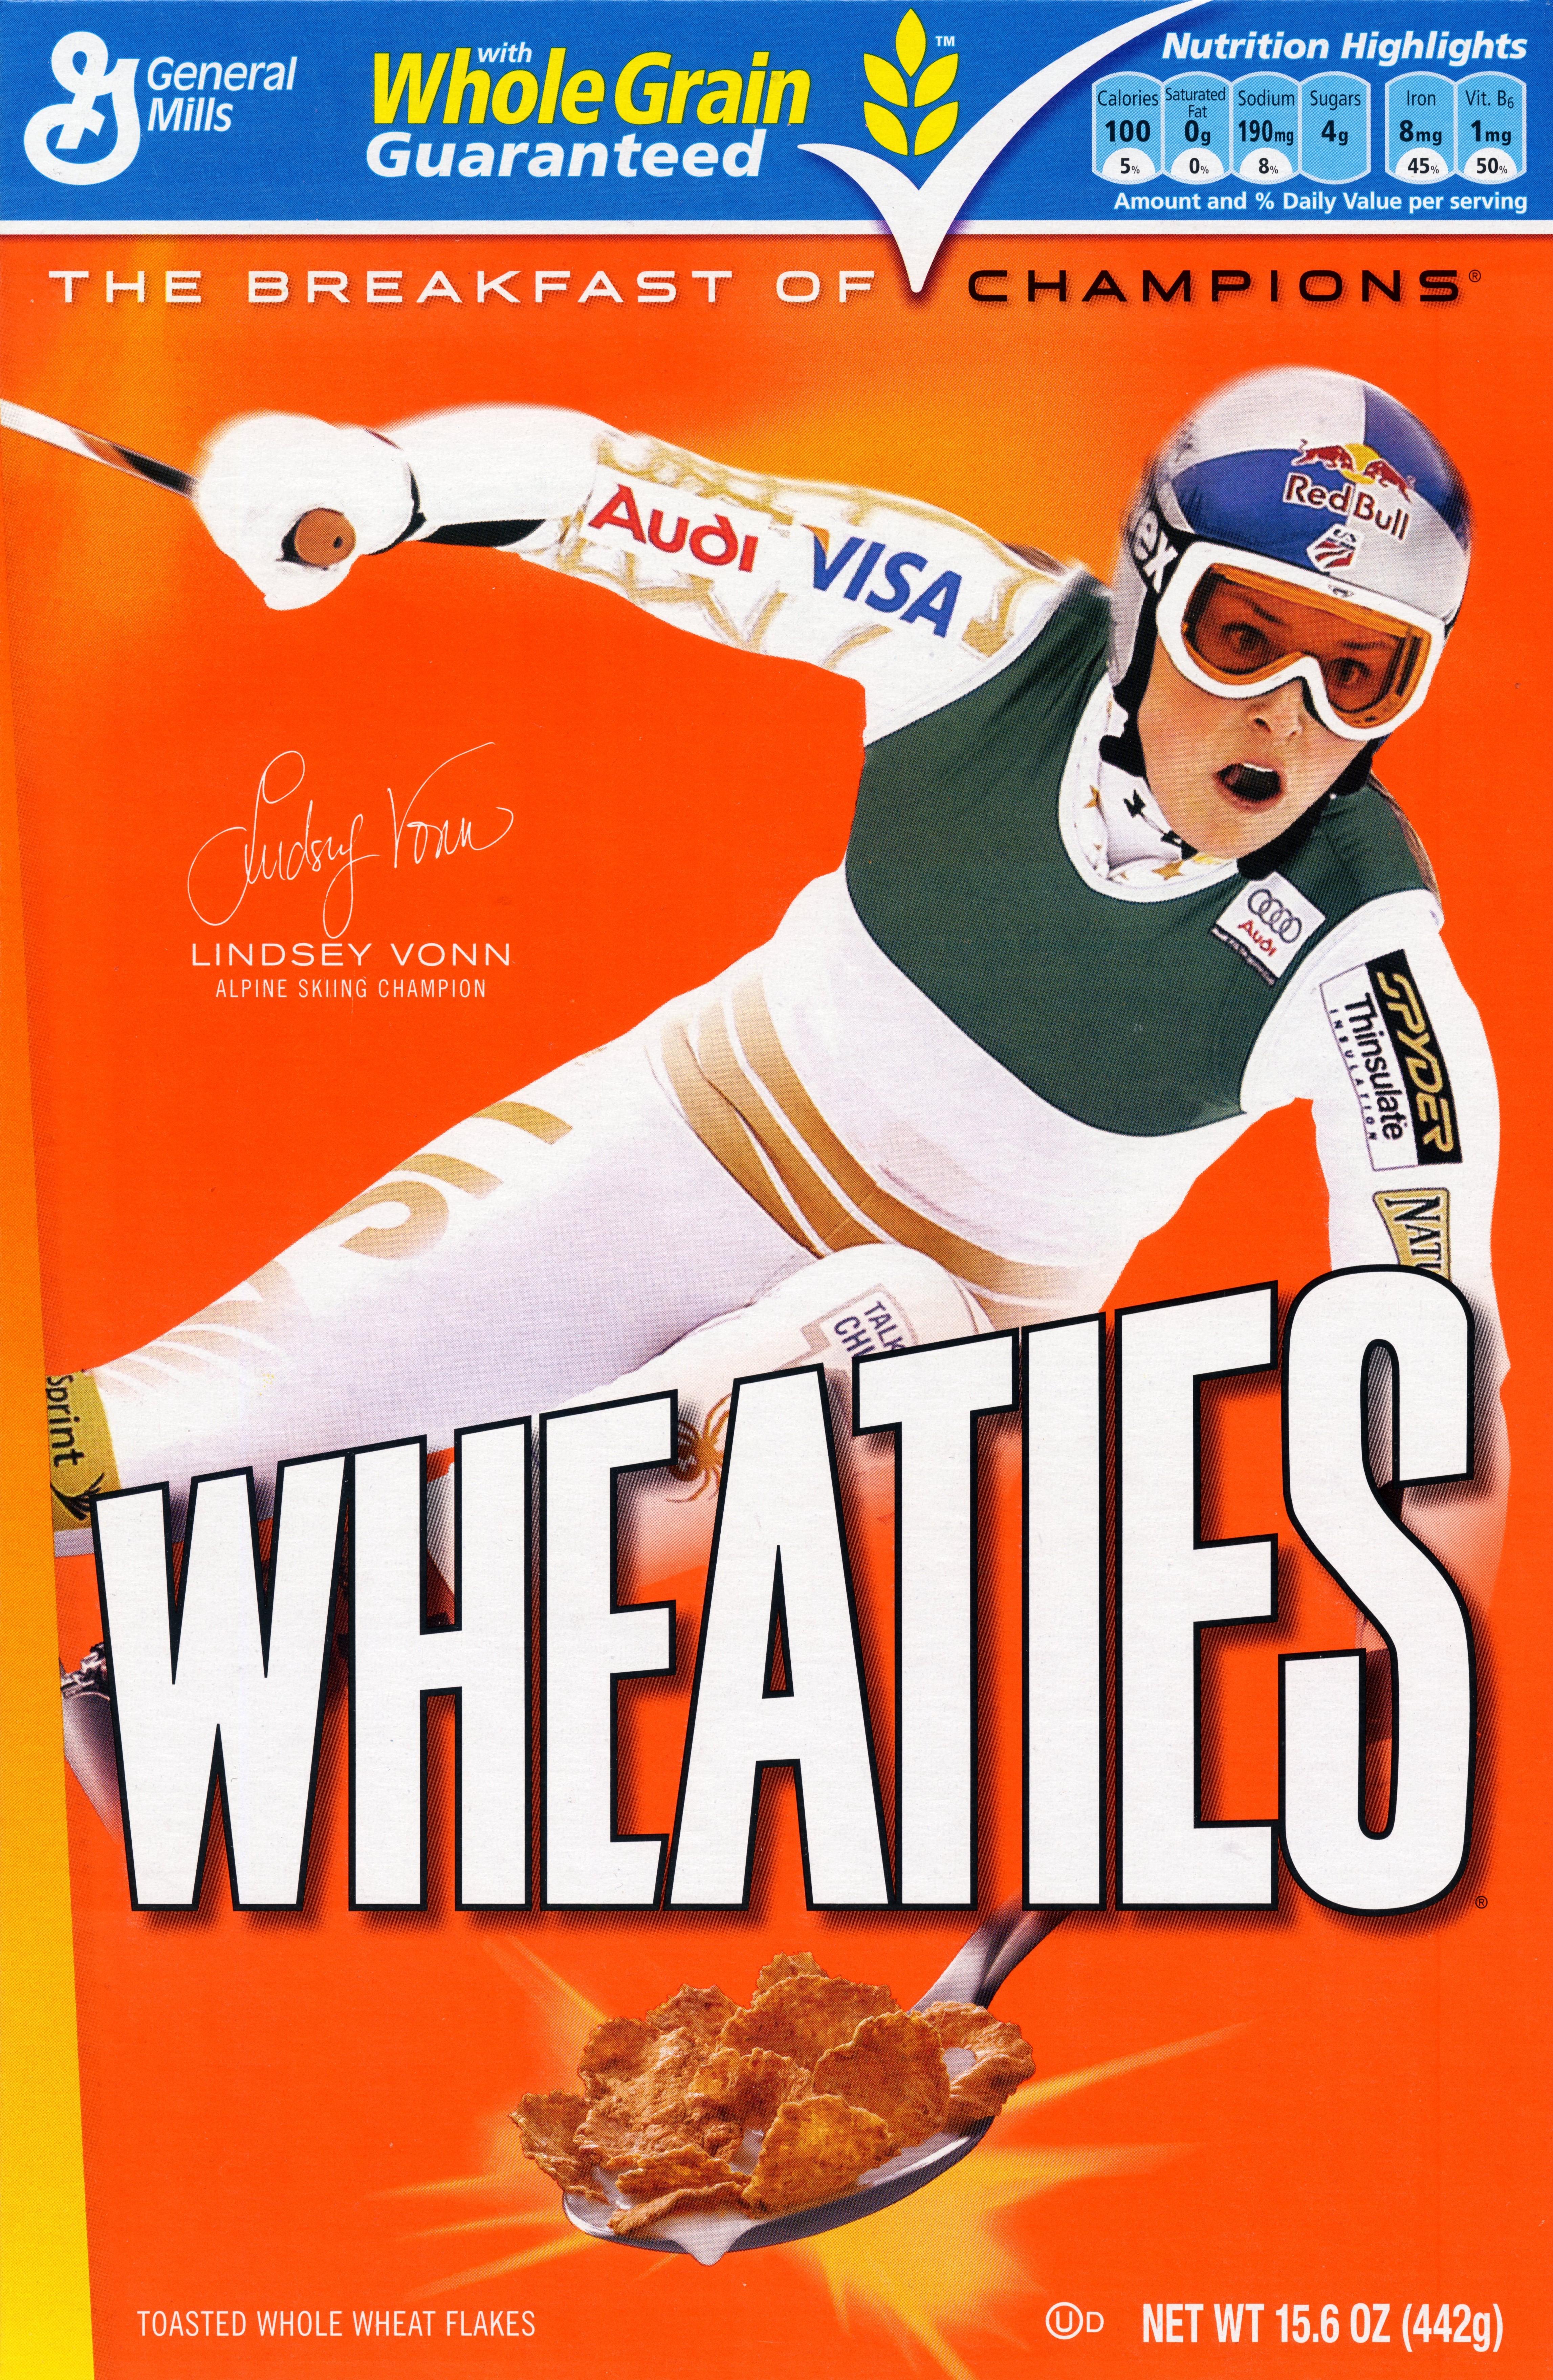 Lindsey Vonn on the Wheaties box.